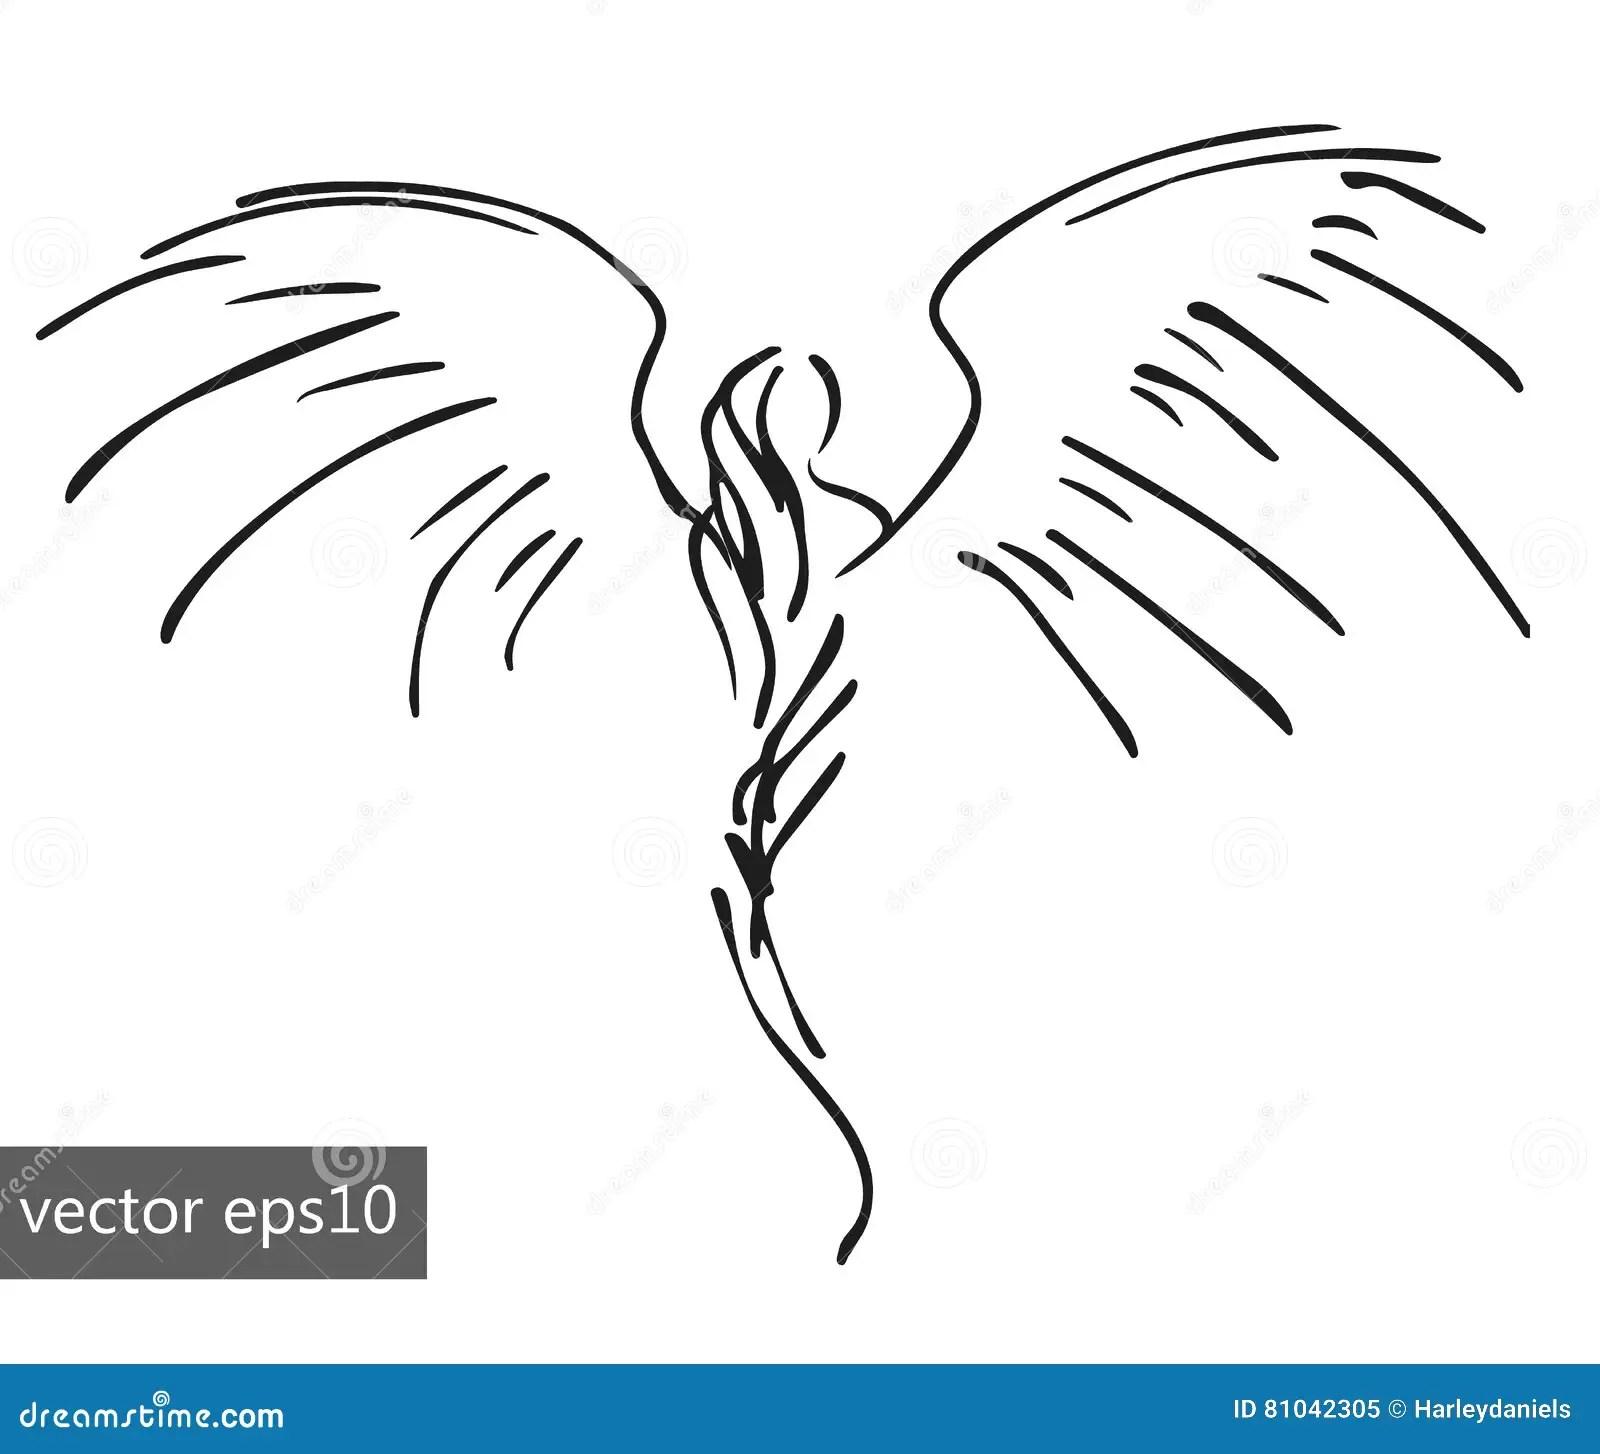 Simple Pinstriping Angel Cartoon Vector